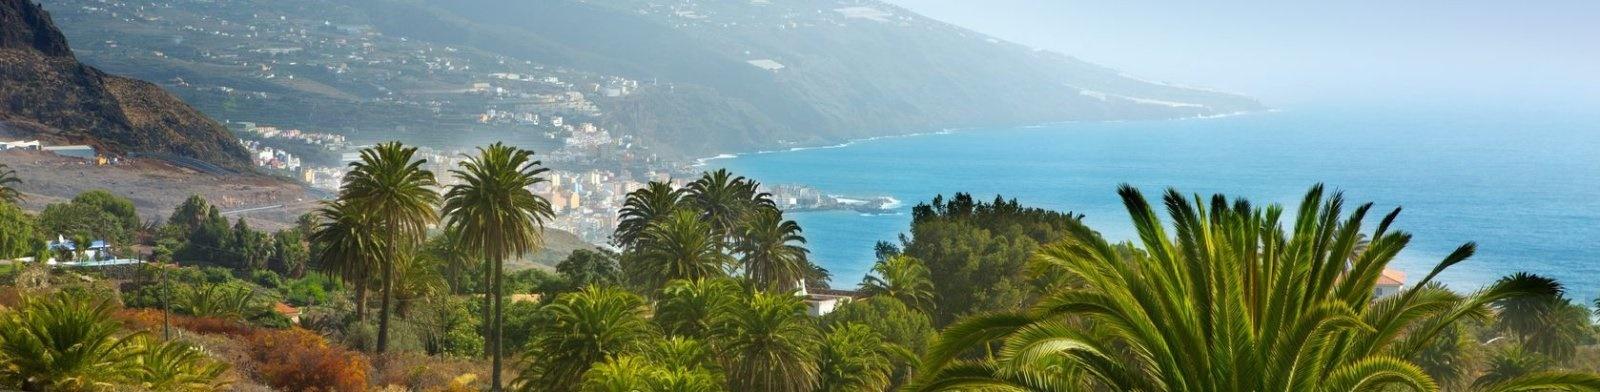 La Palma, Sea scene